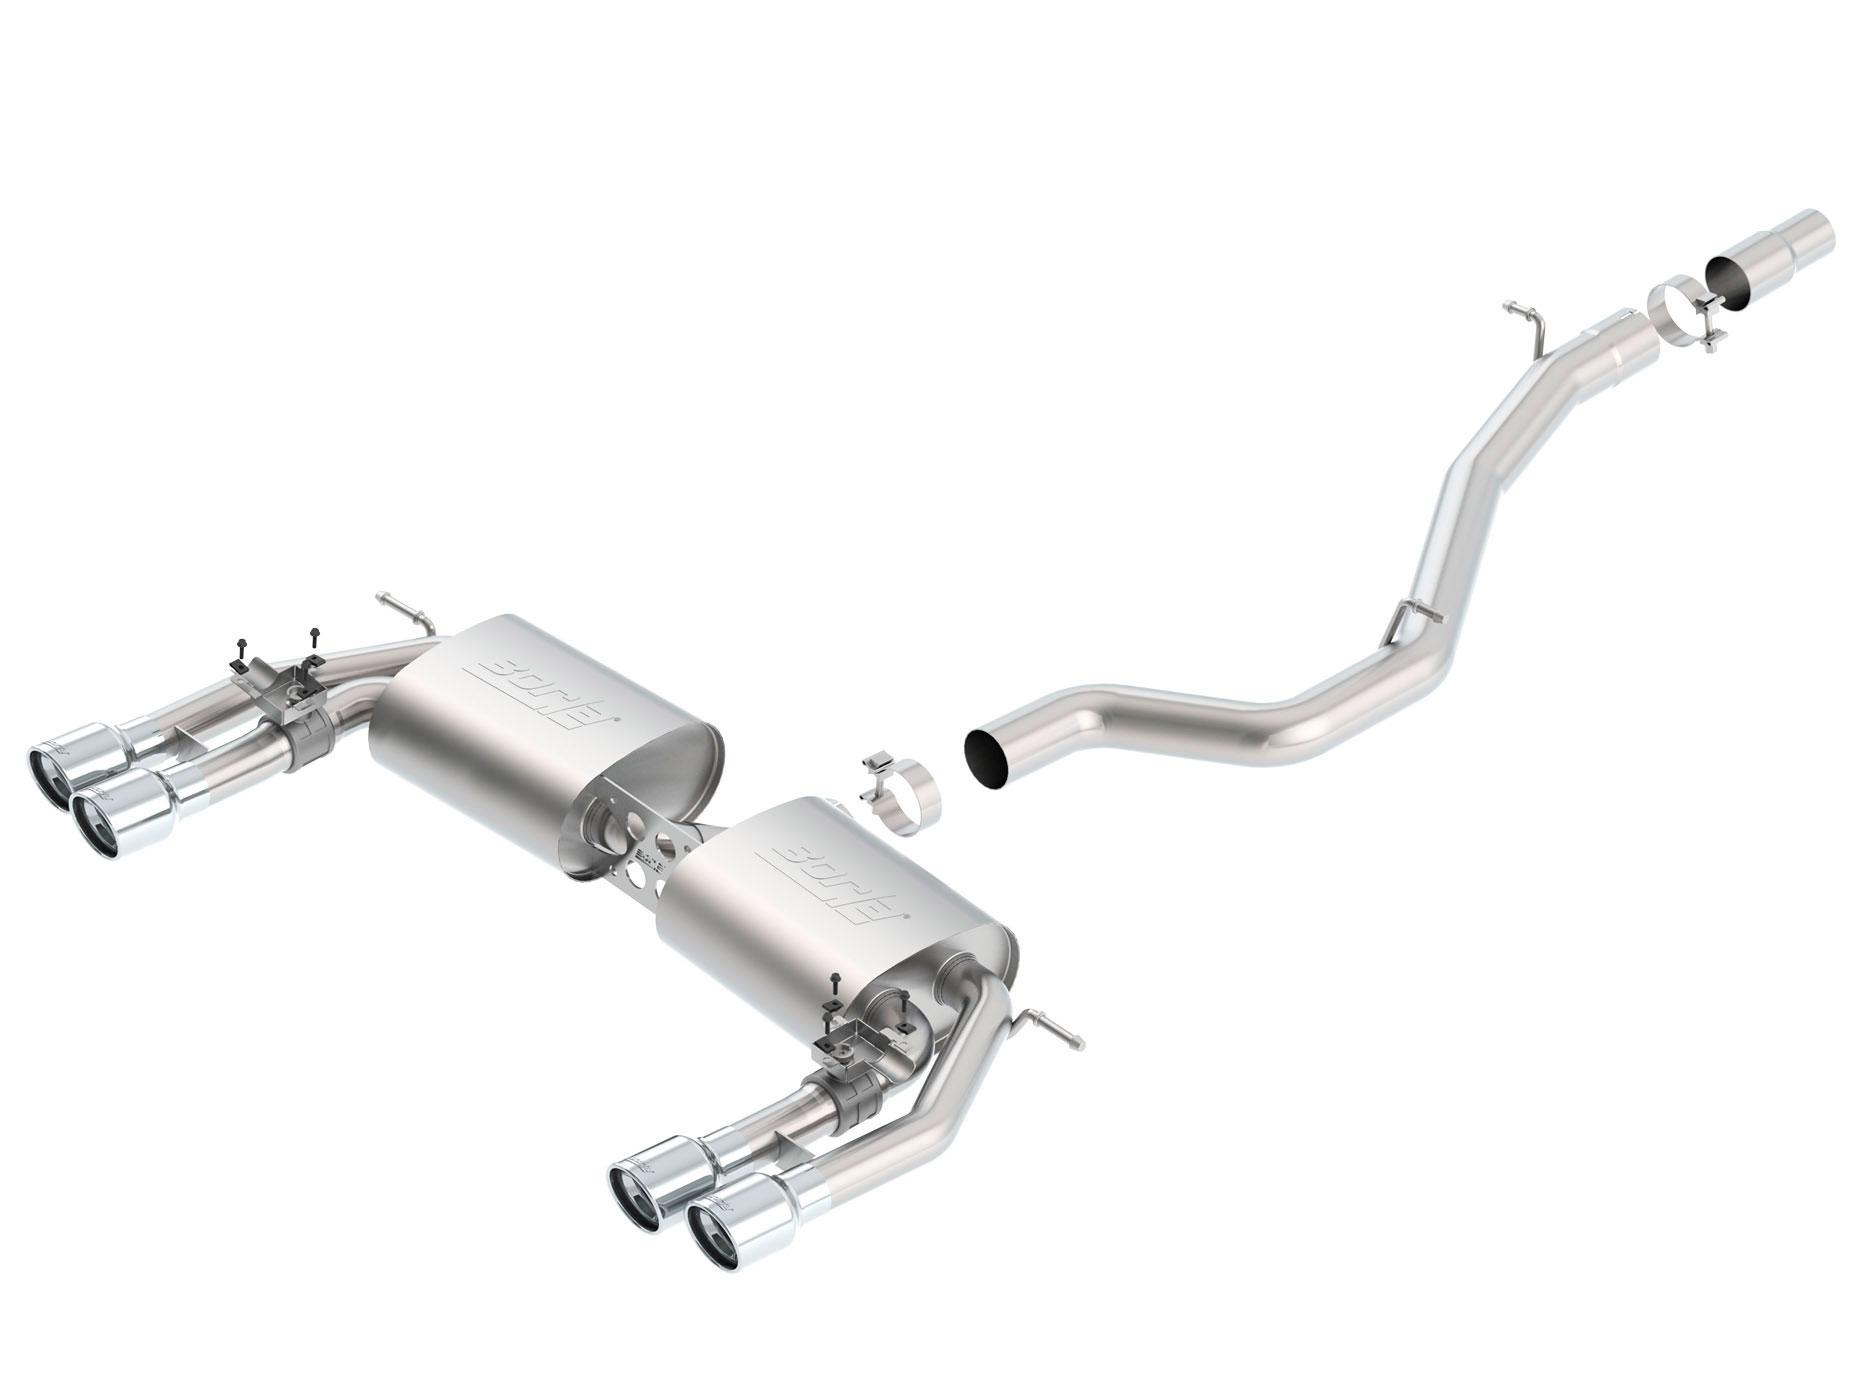 borla exhaust 140631 borla audi s3 s type cat back exhaust system rh lmperformance com Audi A3 Exhaust Tips Audi A3 2.0T Exhust